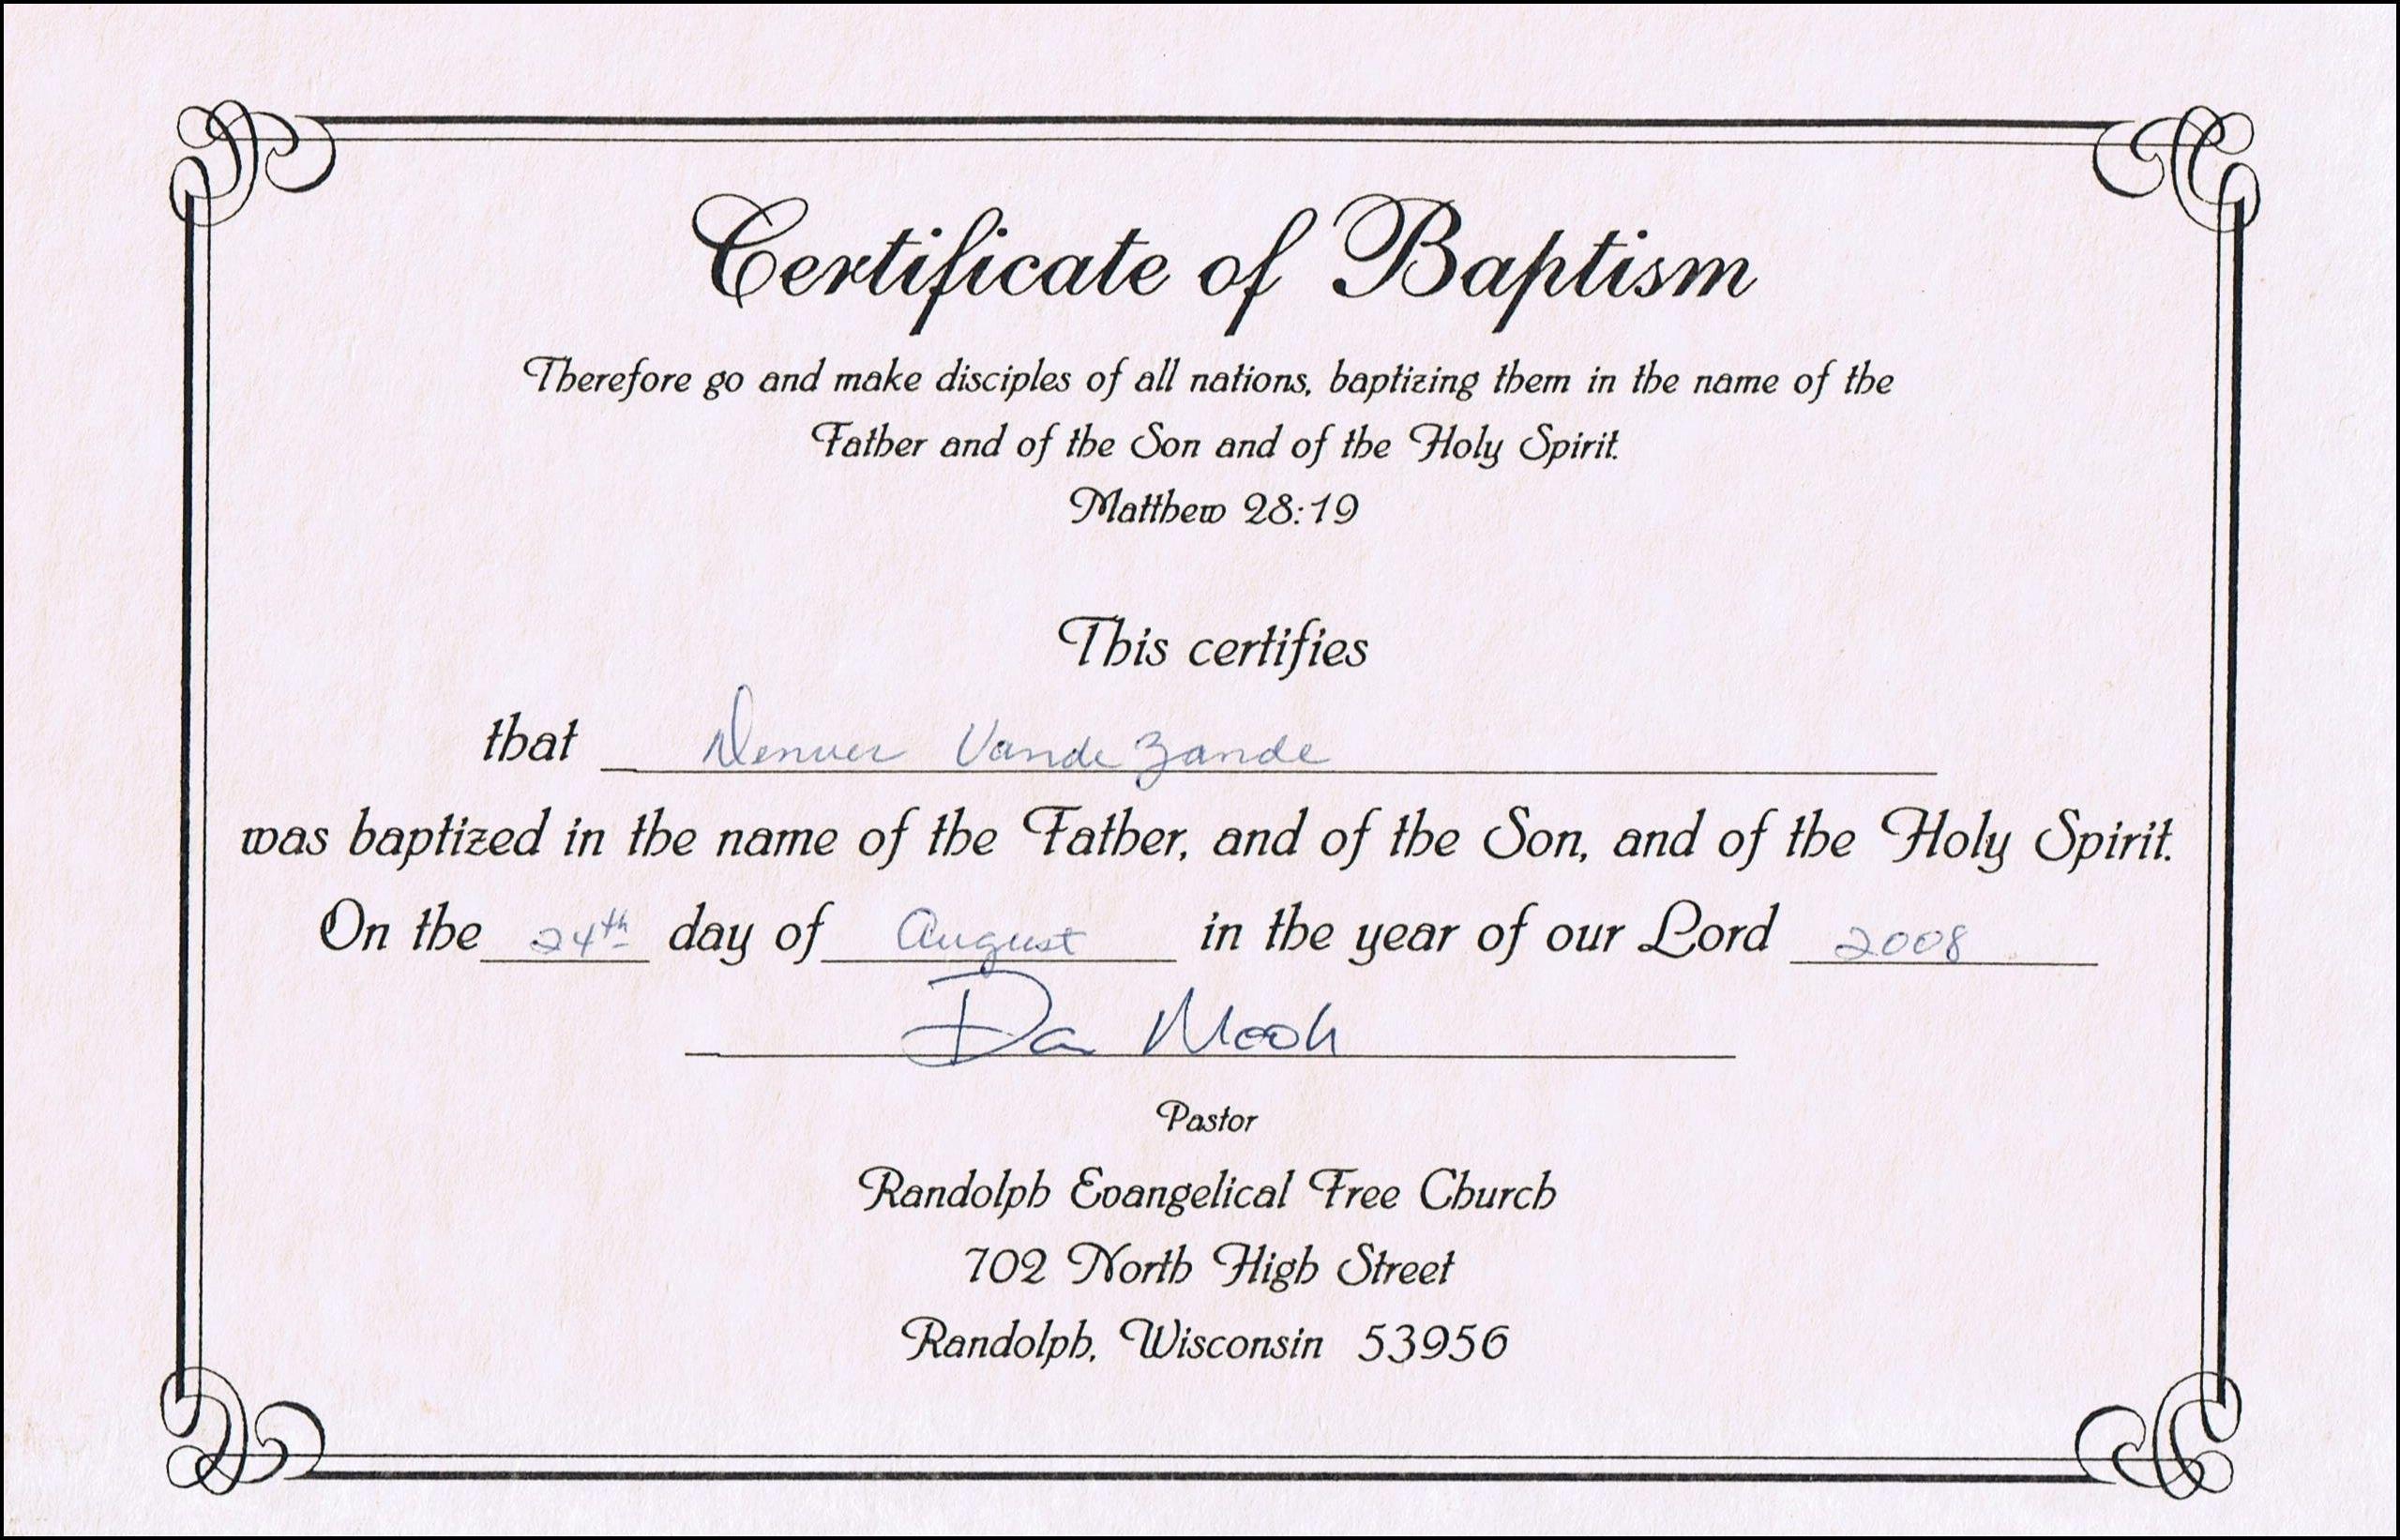 Online Baptism Certificate  Sansurabionetassociats Pertaining To Christian Baptism Certificate Template